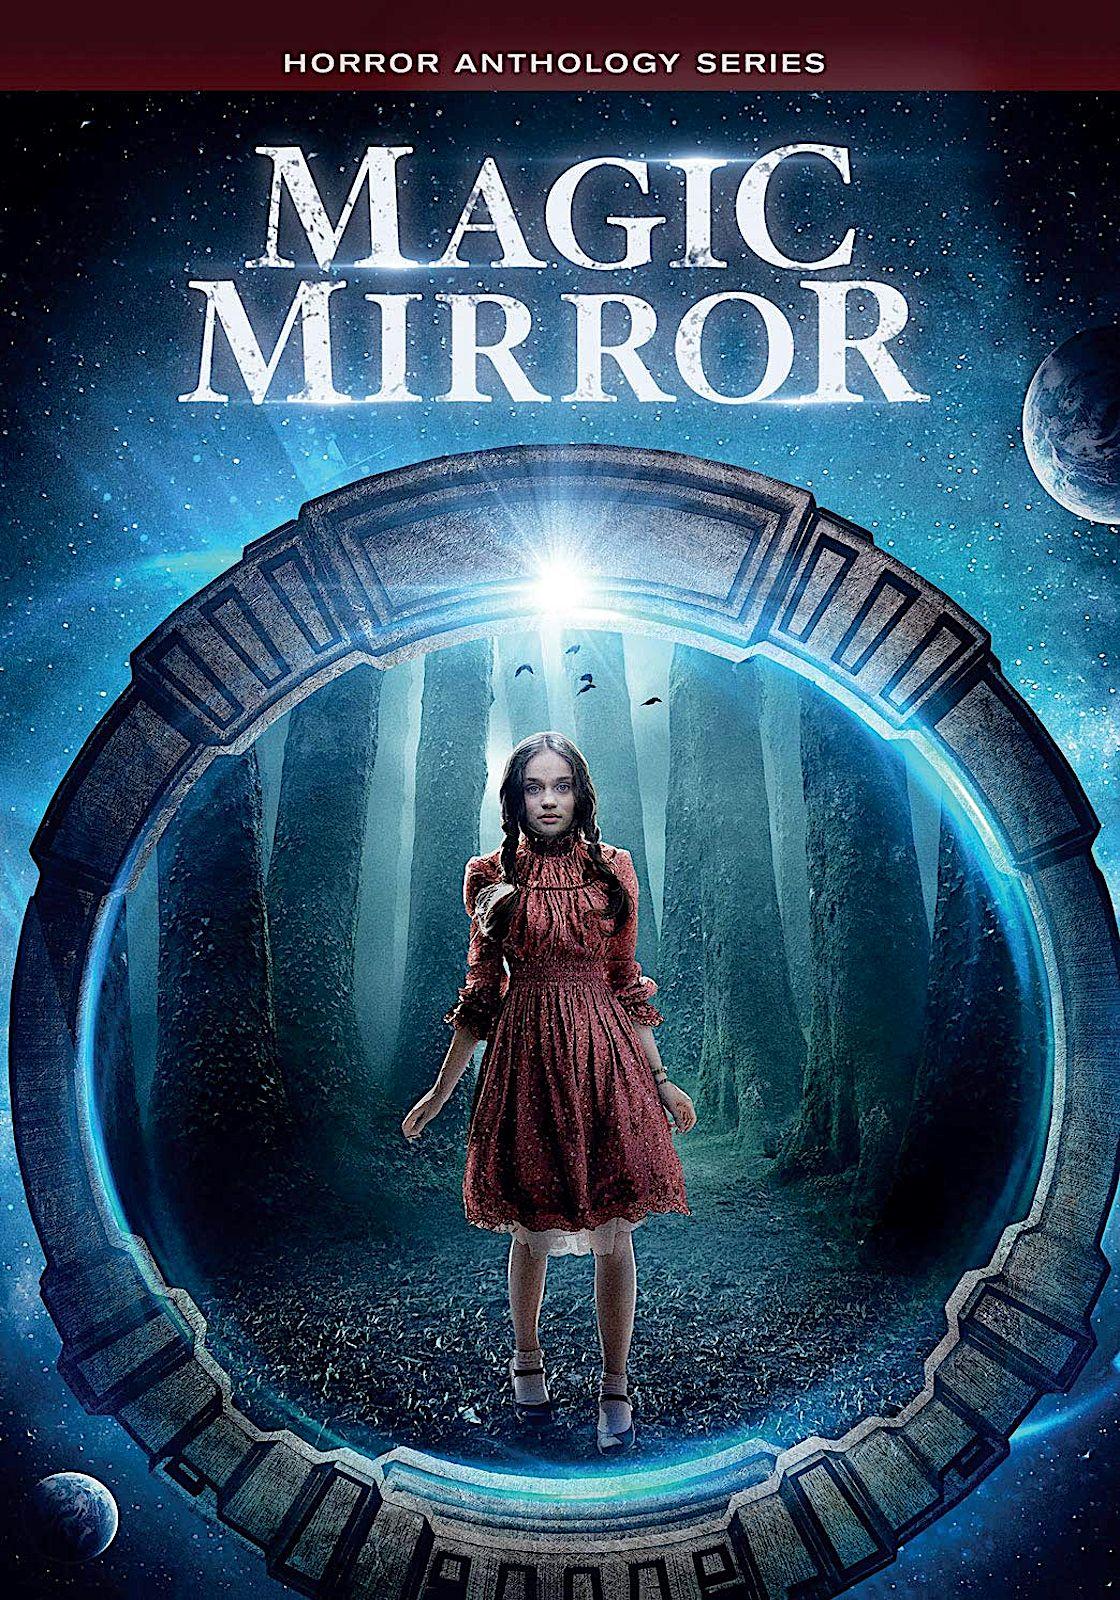 MAGIC MIRROR DVD (RUTHLESS STUDIOS) in 2020 Magic mirror